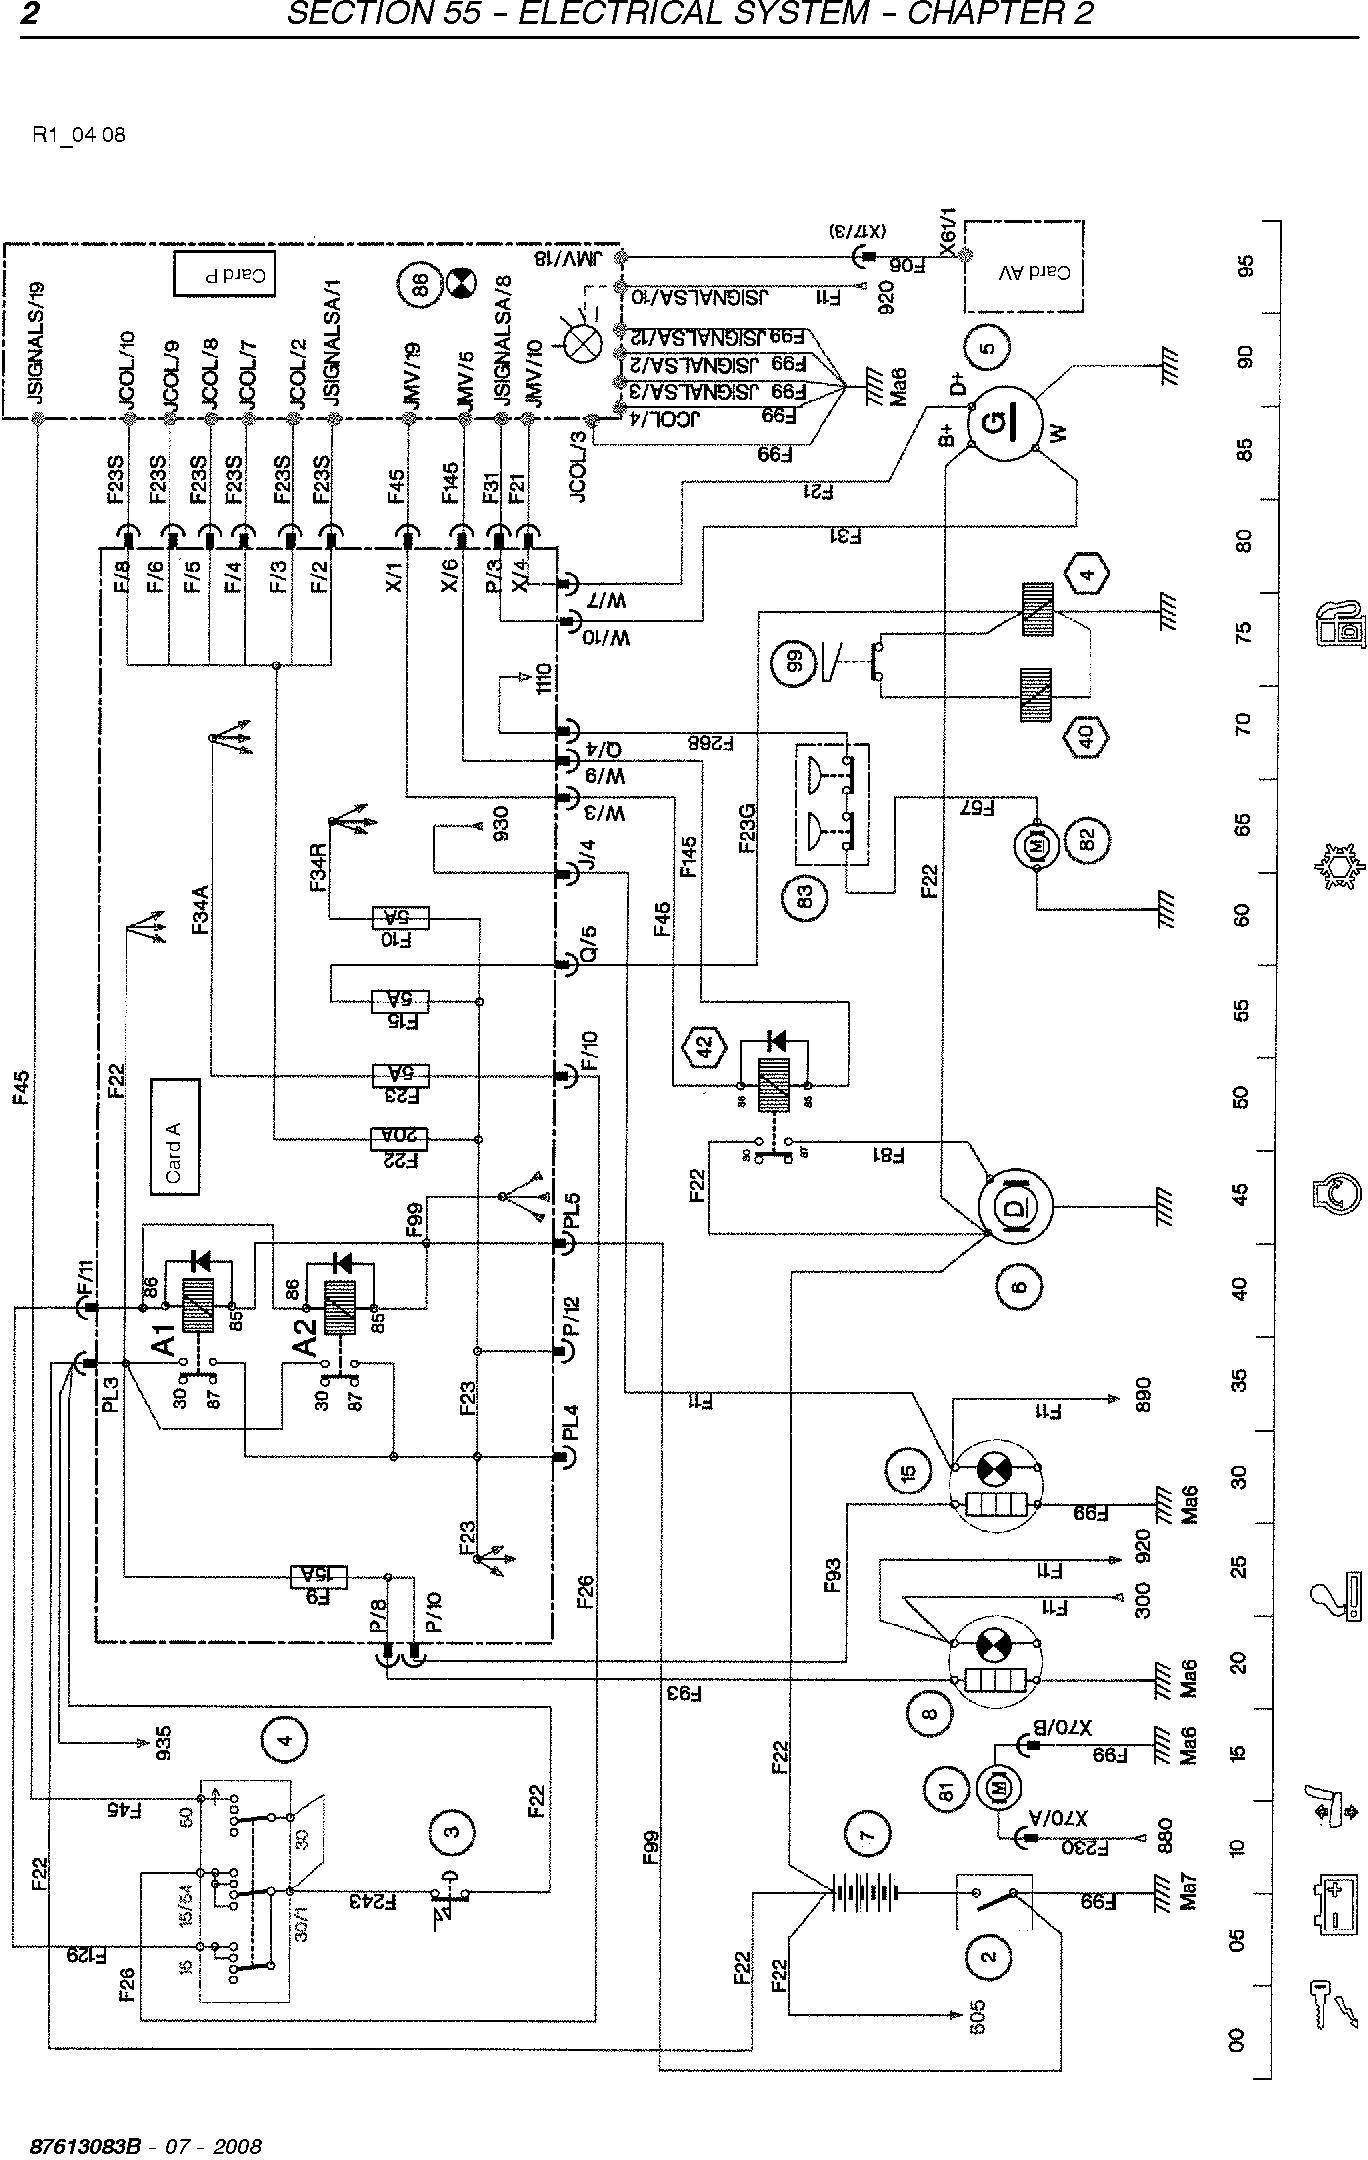 New Holland VL5090, VL6040, VL6050, VL6060, VL6070, VL6080, VL6090, VM3090, VM4090, VN2090 Grape Harvester Service Manual - 3